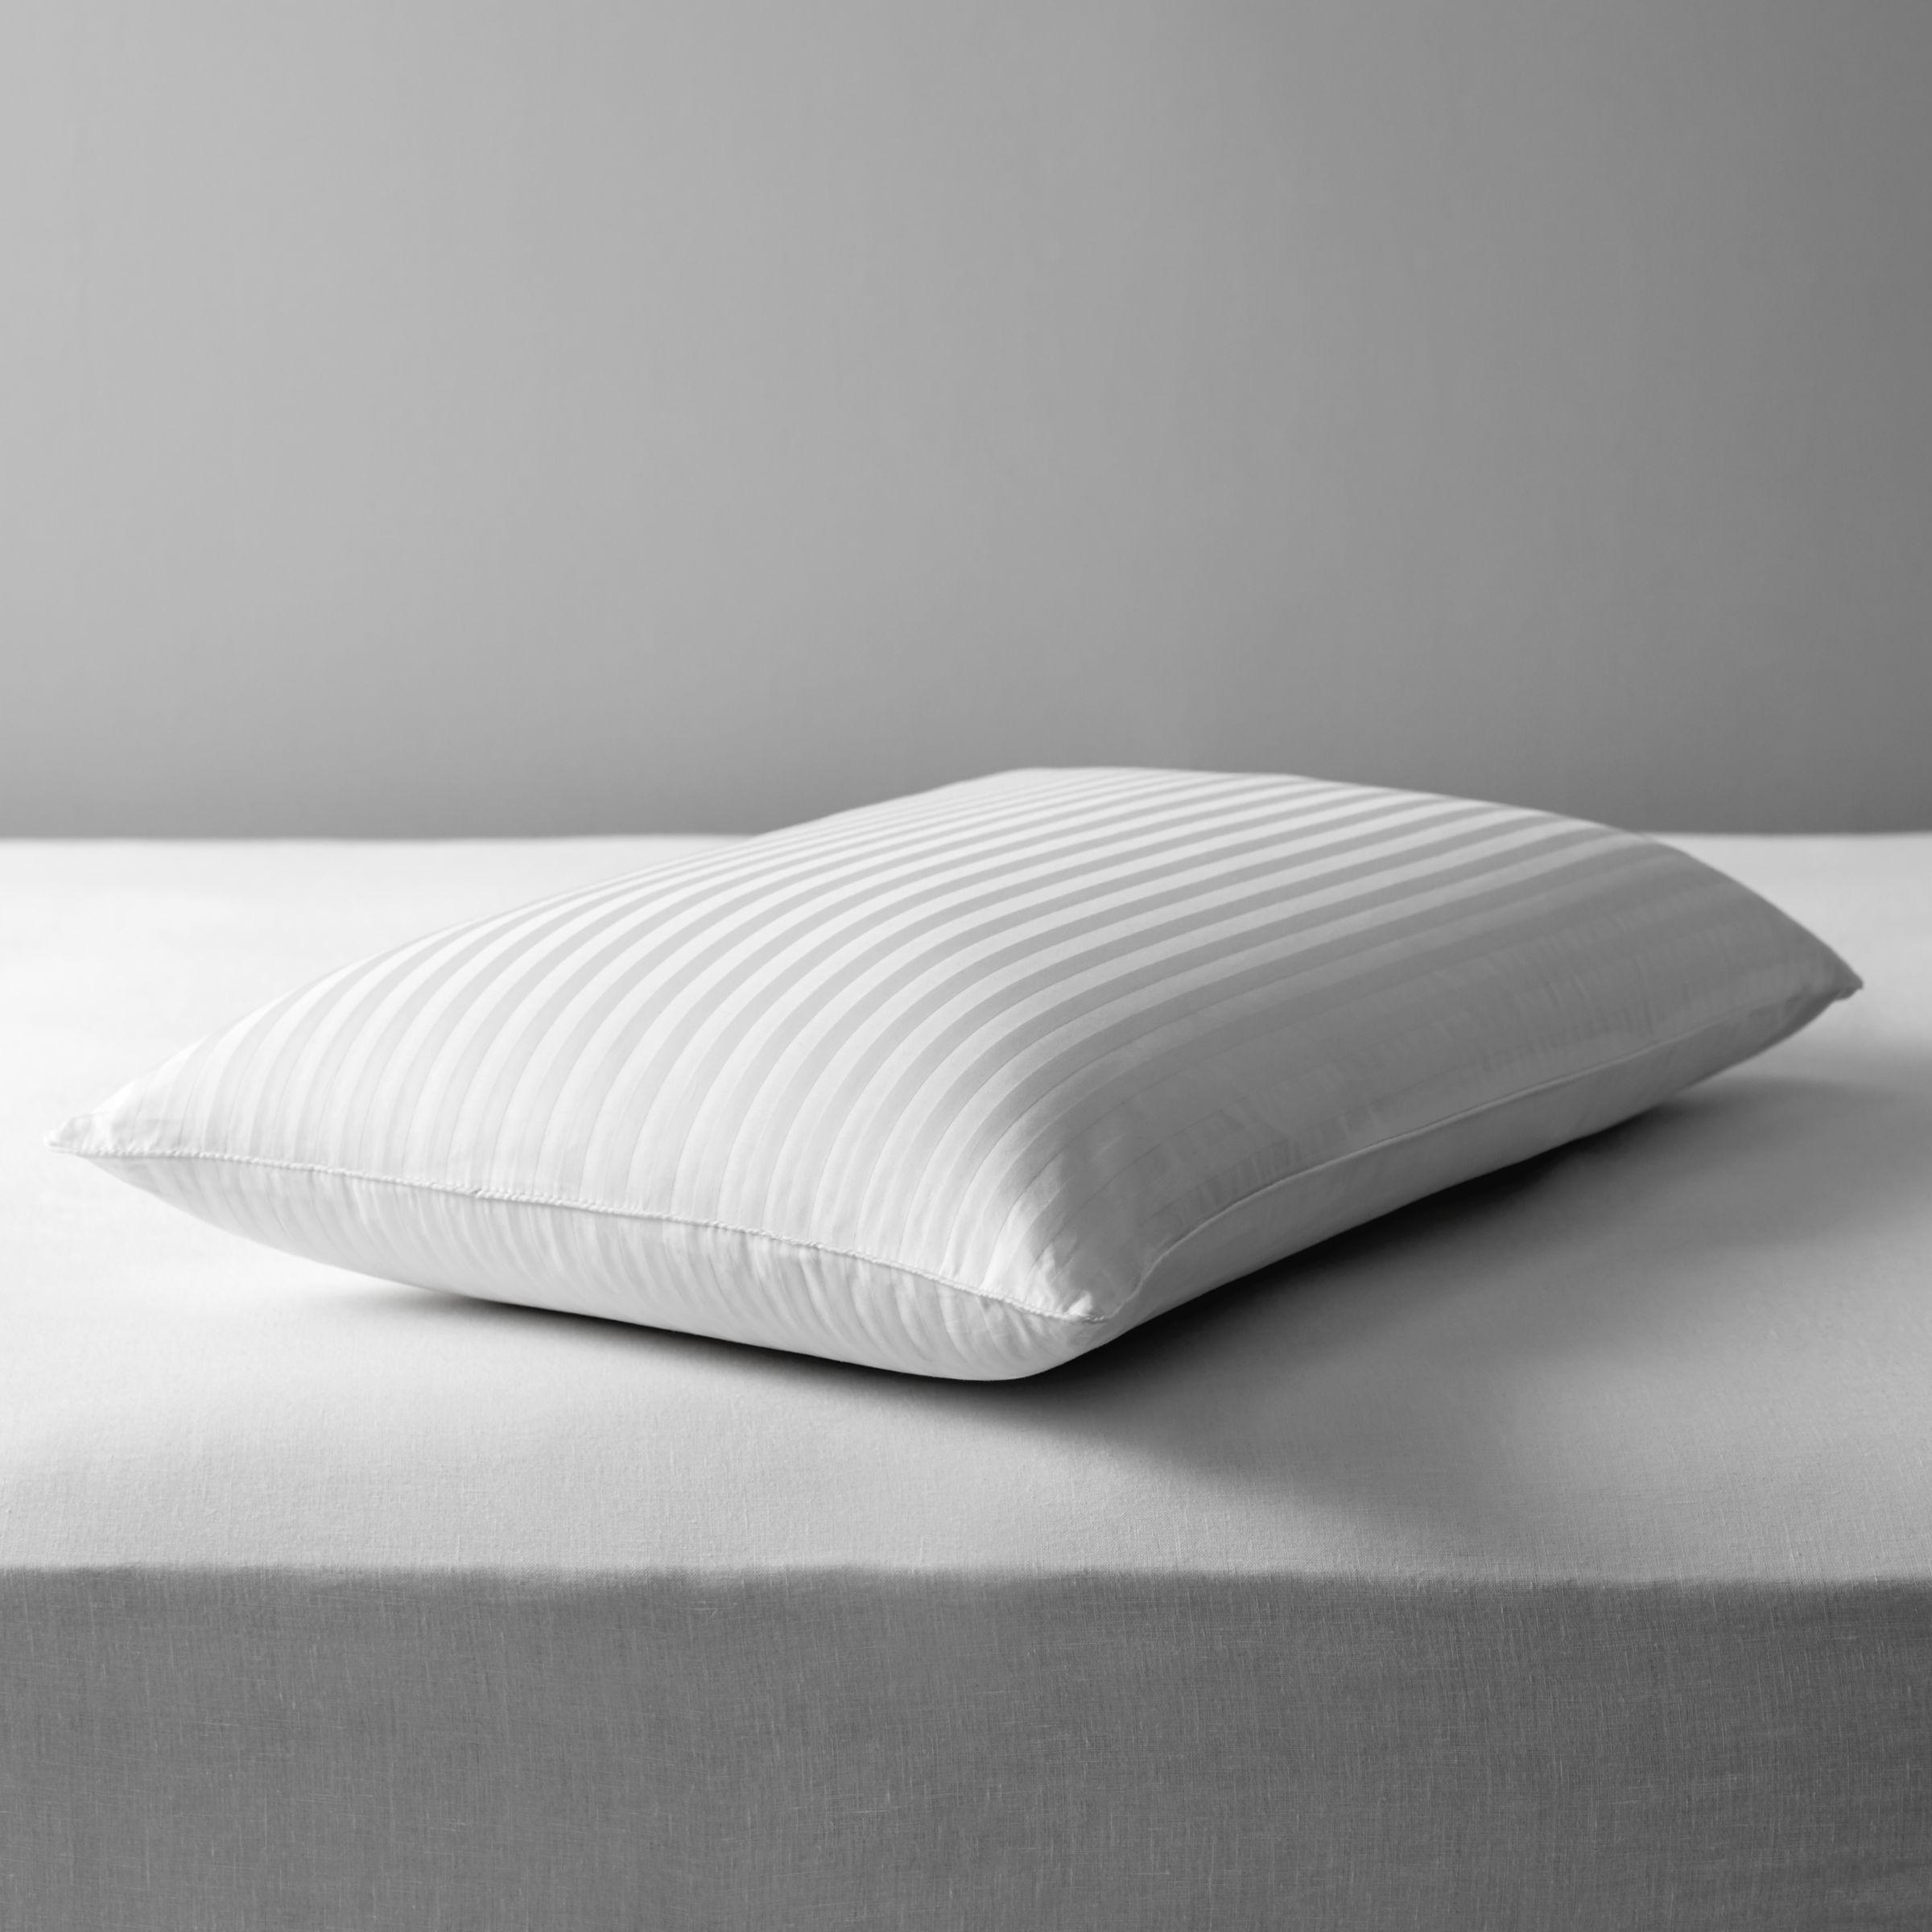 Dunlopillo Dunlopillo Latex Serenity Pillow, Firm